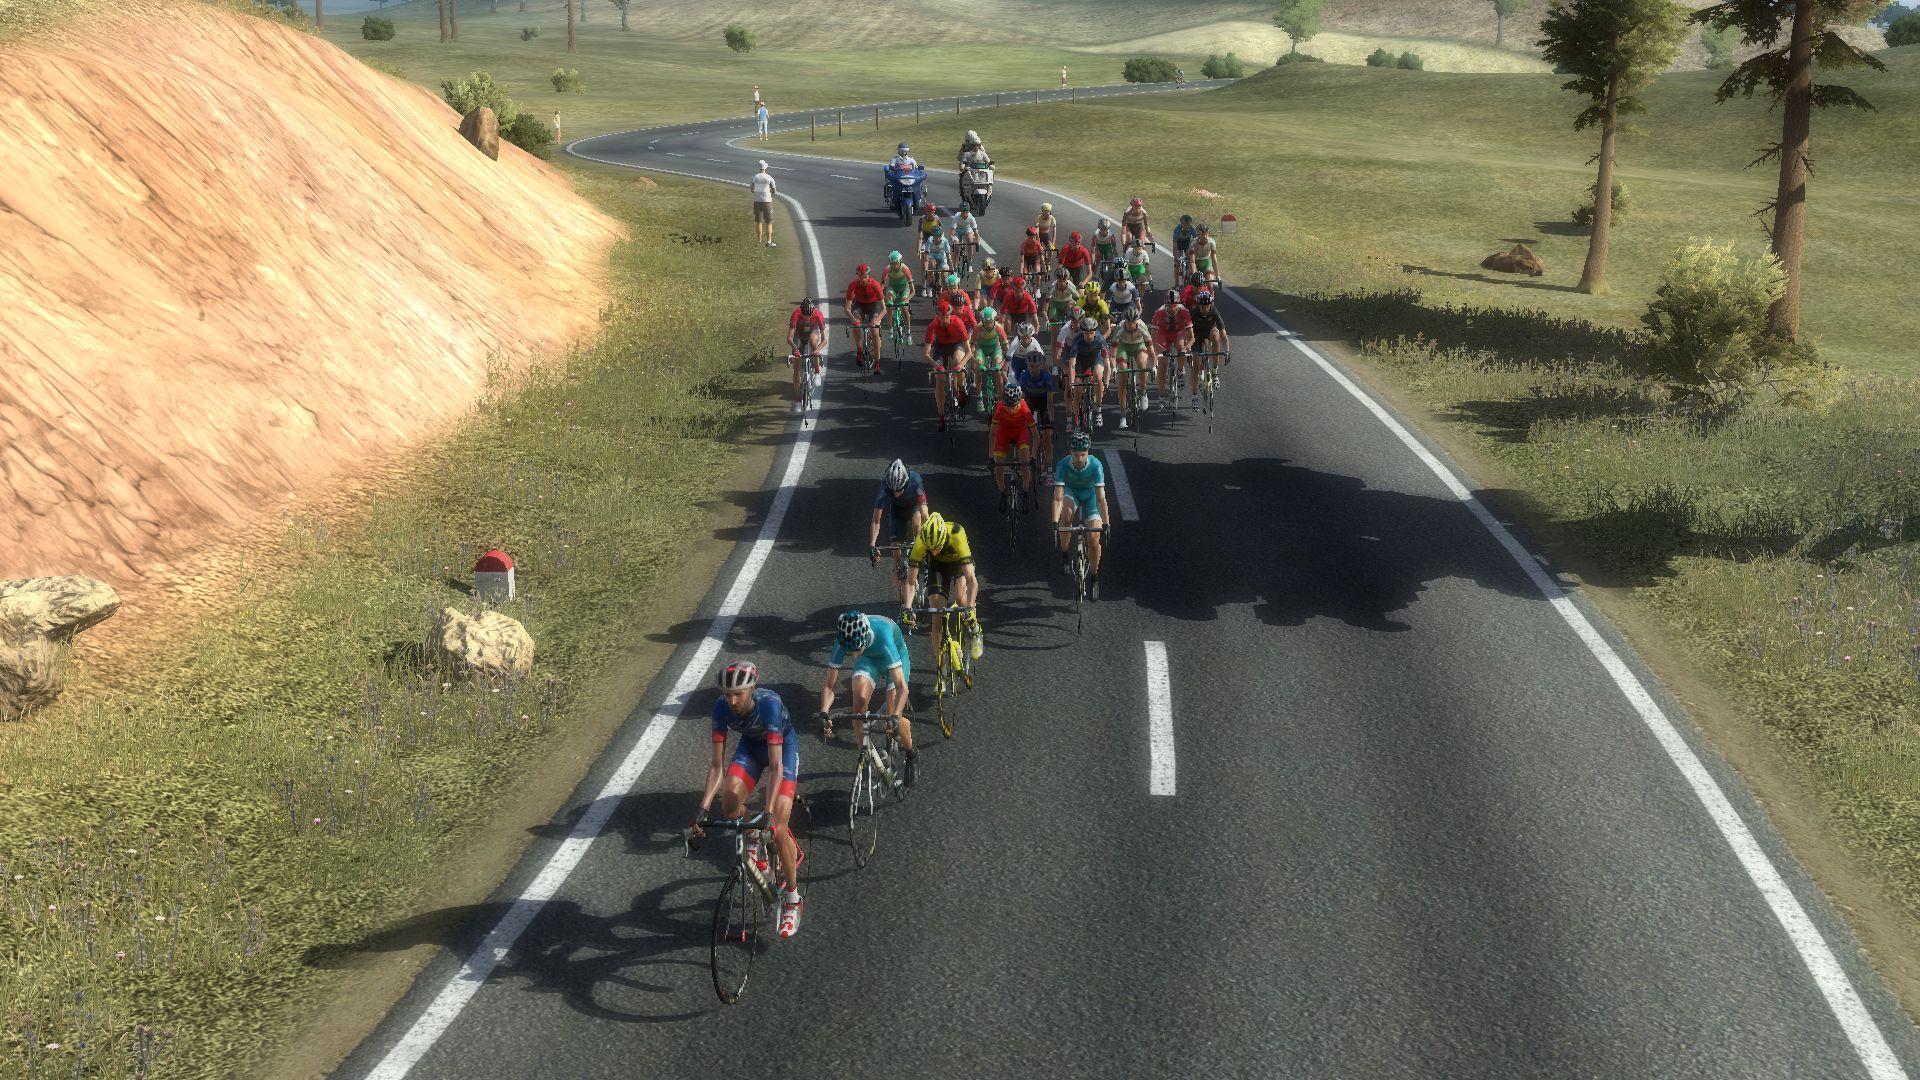 pcmdaily.com/images/mg/2020/Reports/HC/Corsica/CIS3%2016.jpg